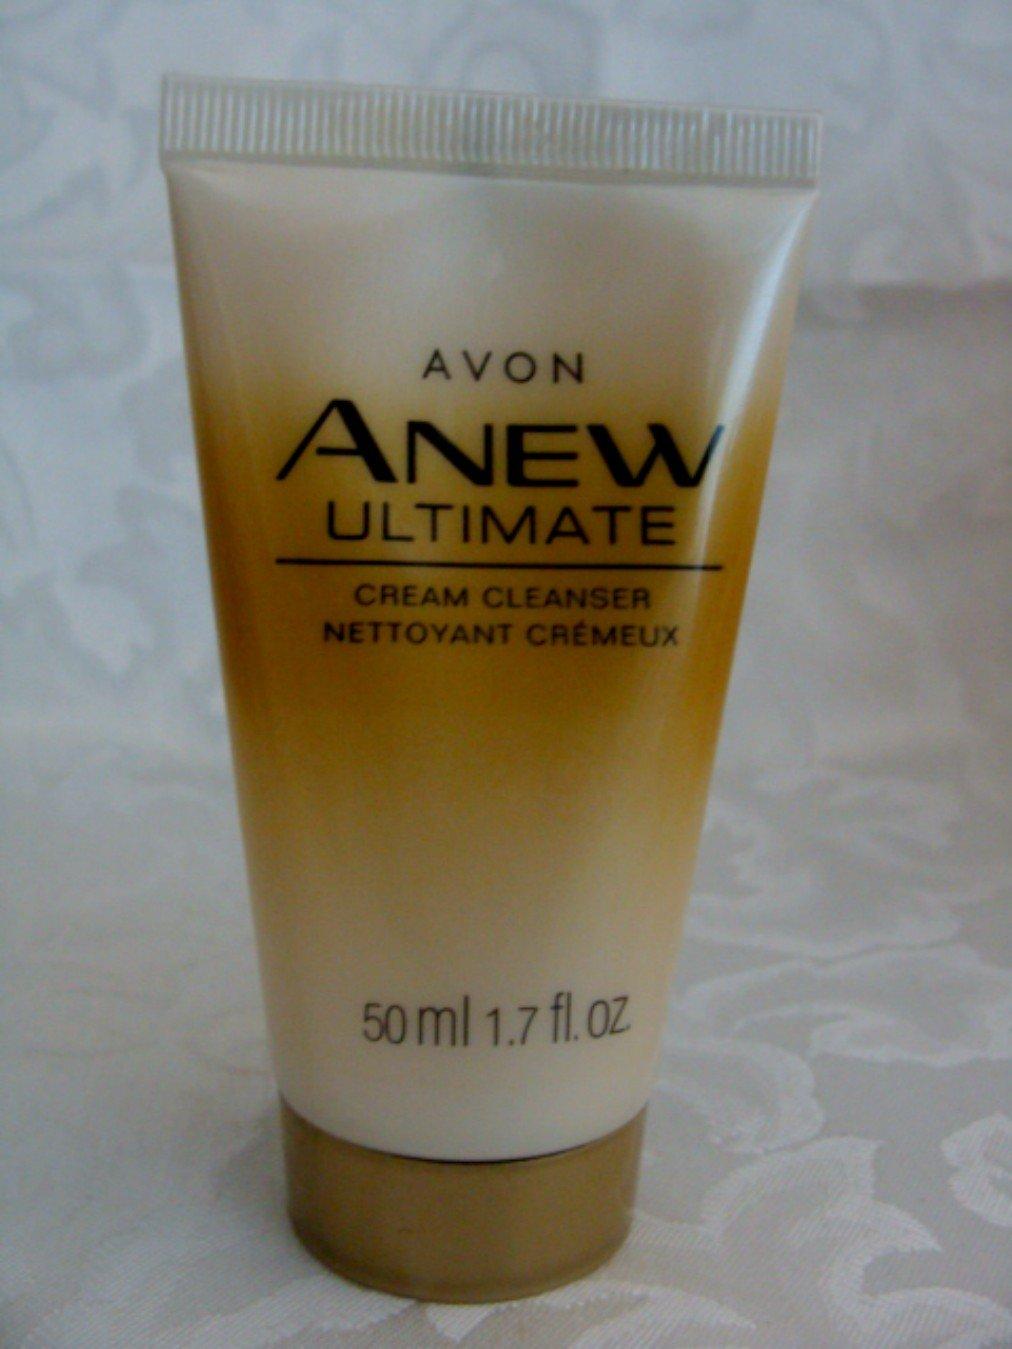 Avon Anew Ultimate Cream Cleanser 1.7 oz.